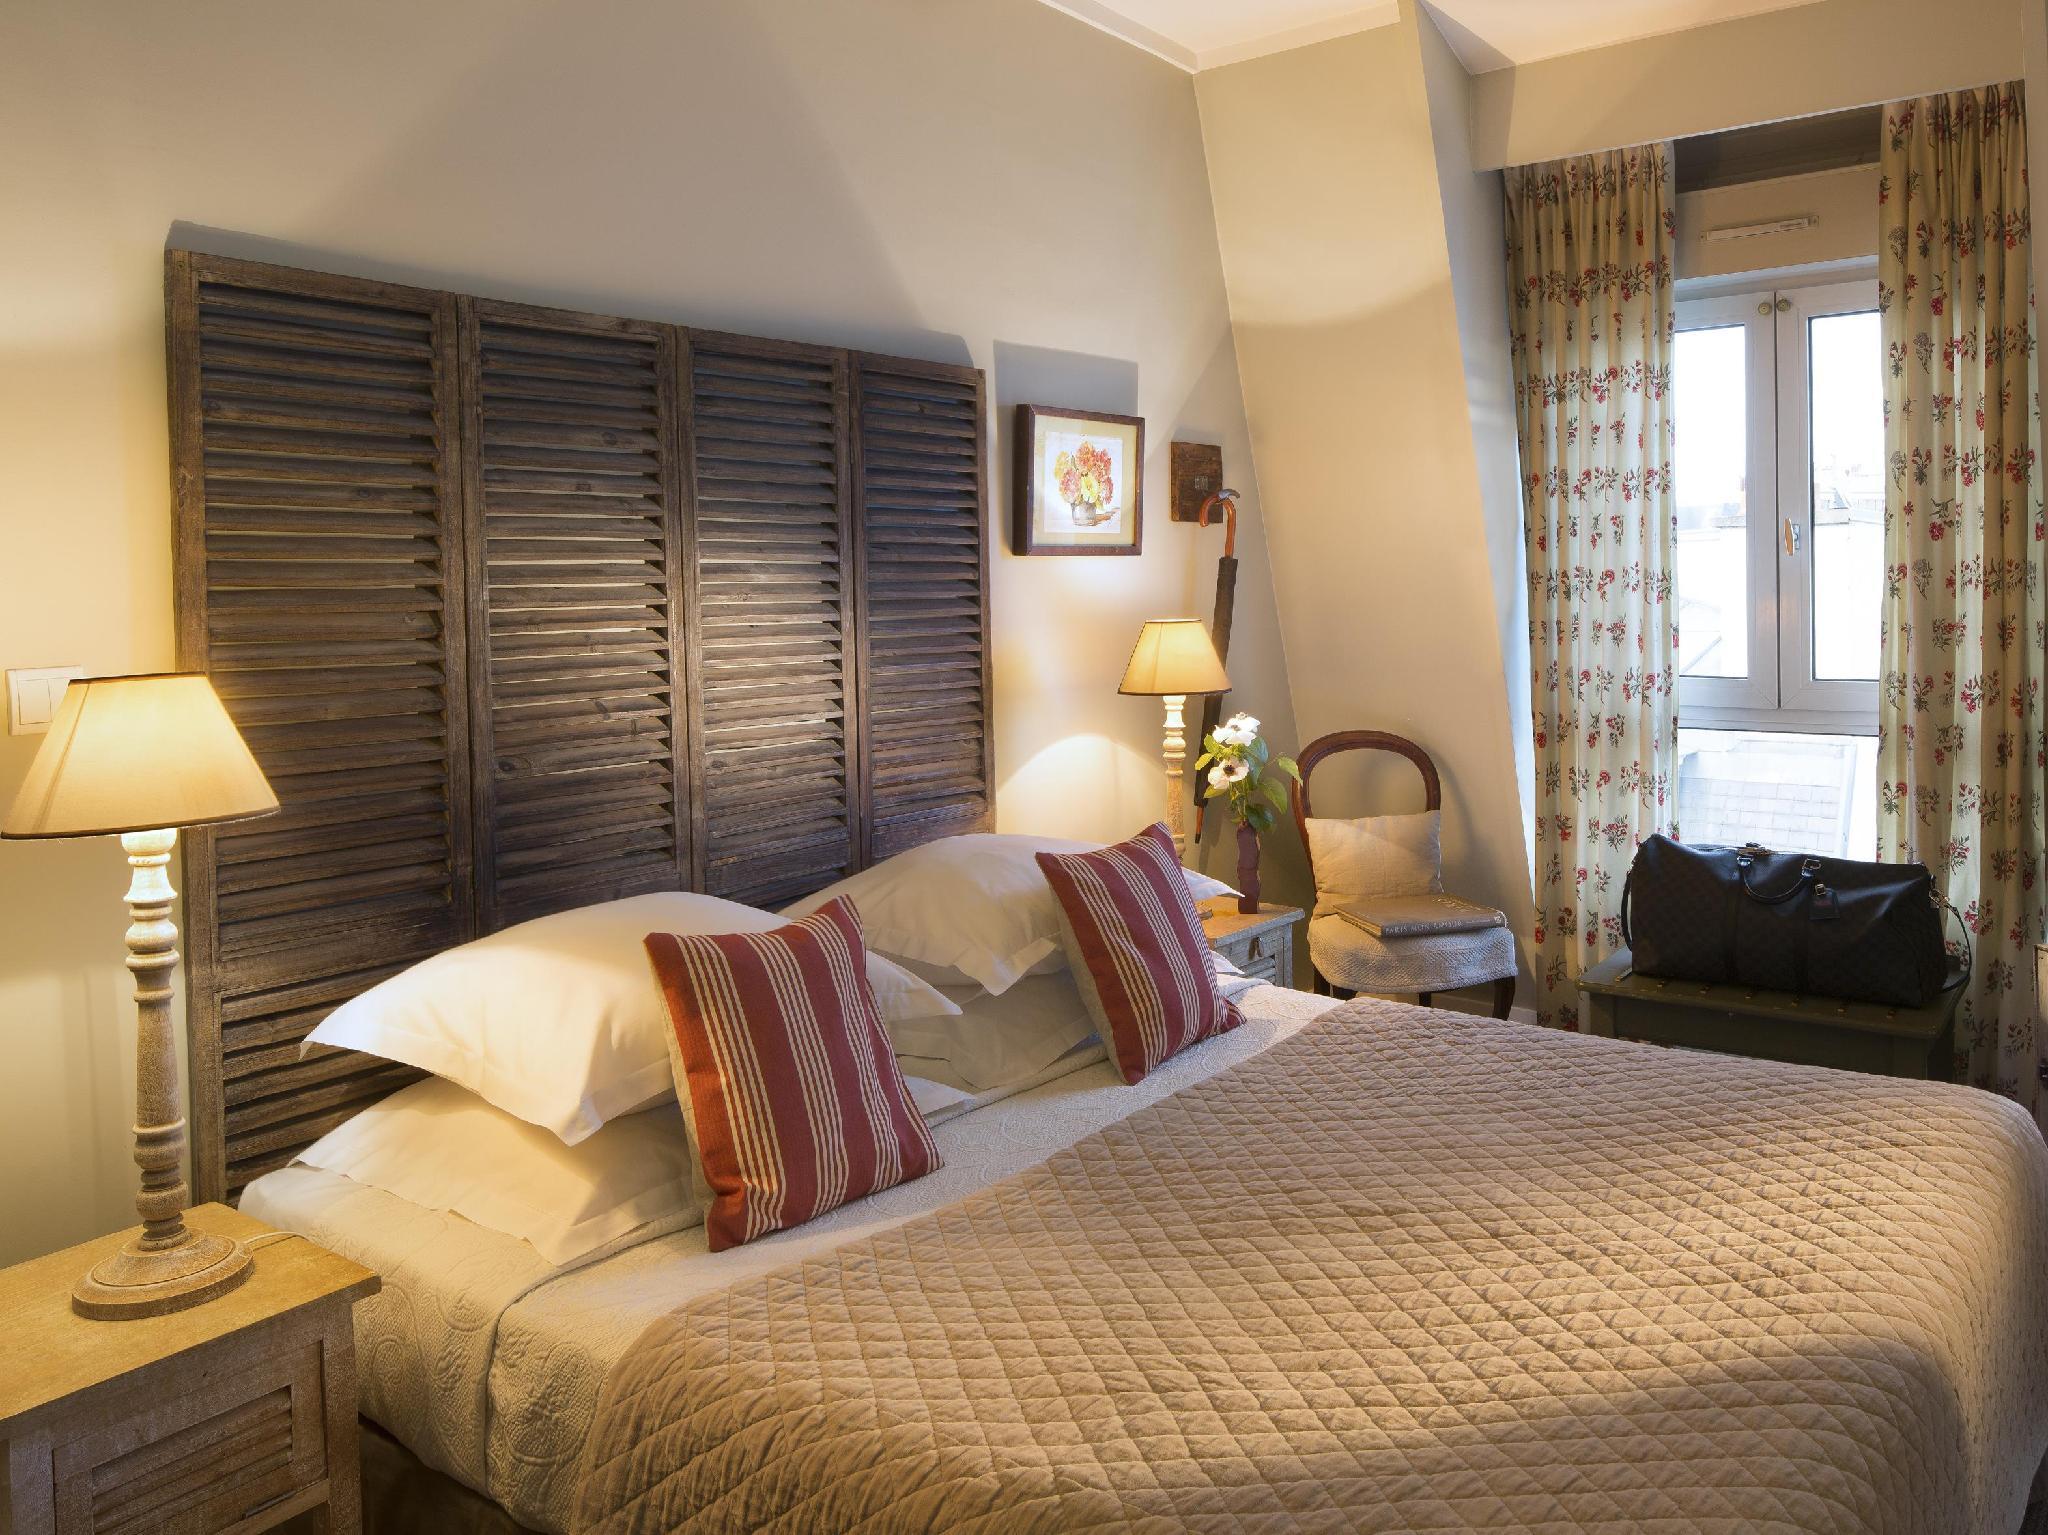 Hotel De La Paix Montparnasse Best Price On Hotel De La Paix Montparnasse In Paris Reviews